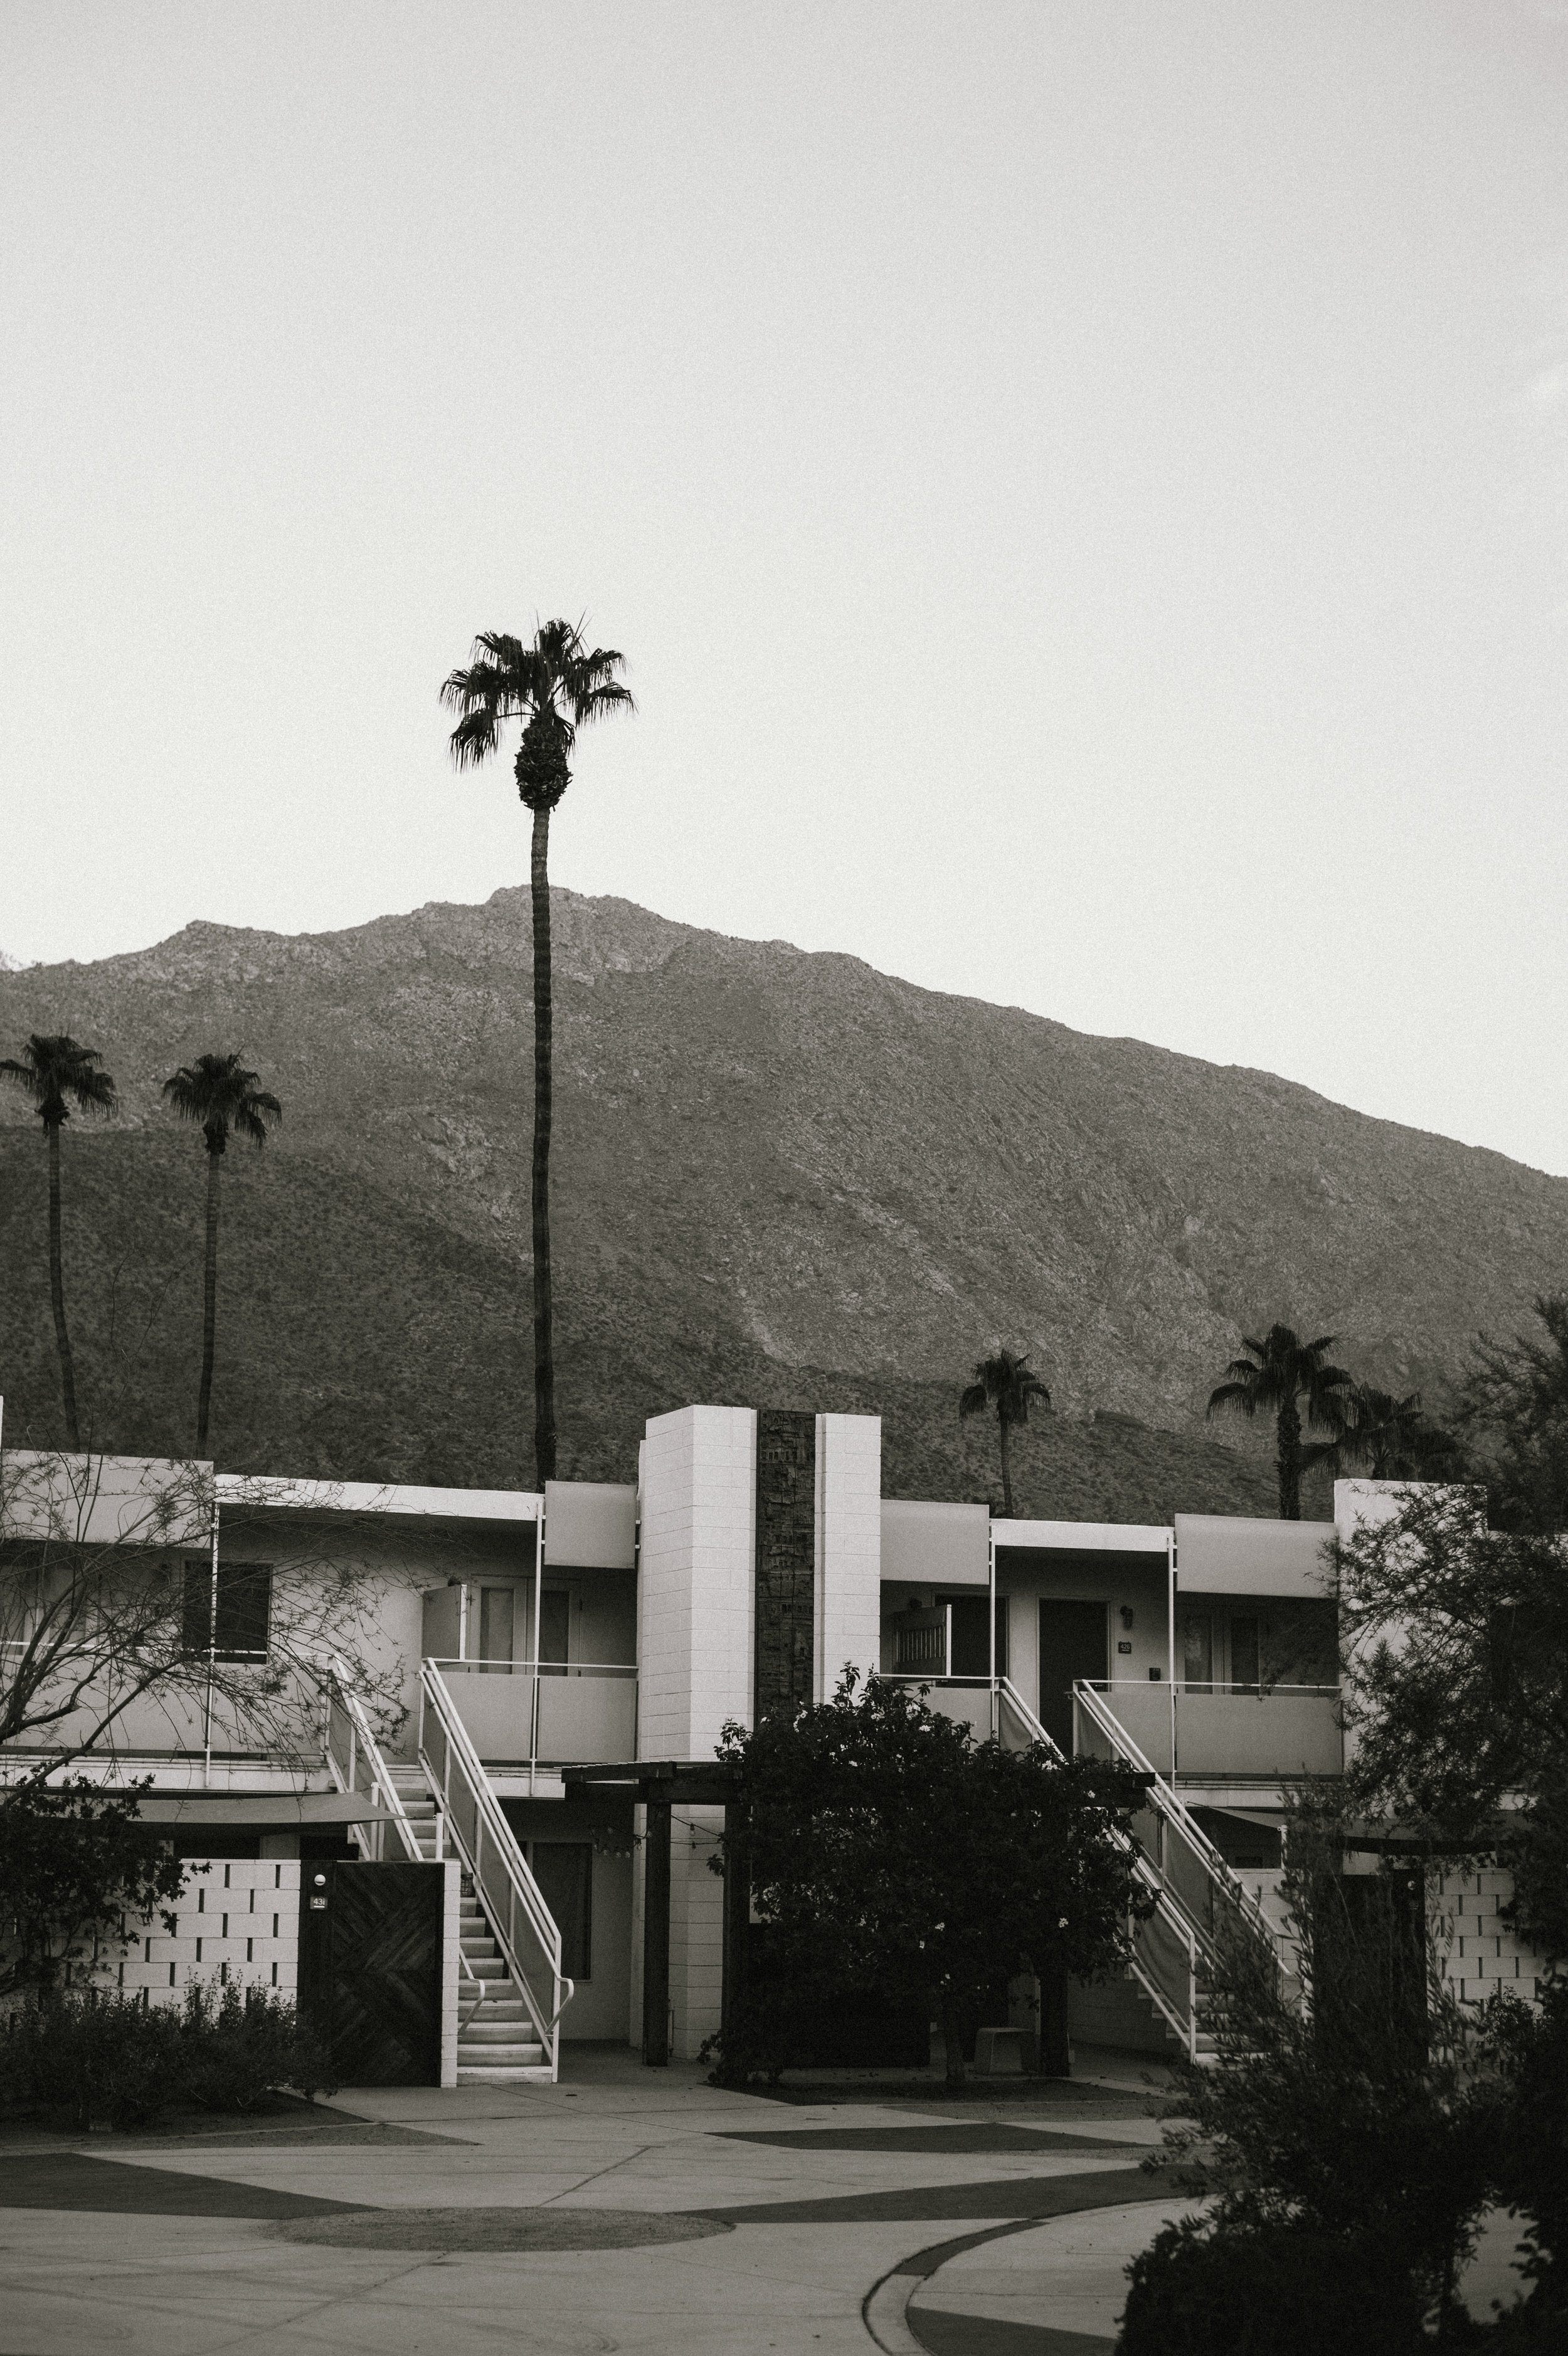 The-Glossier-Ace-Hotel-Palm-Springs-CA-4.jpg